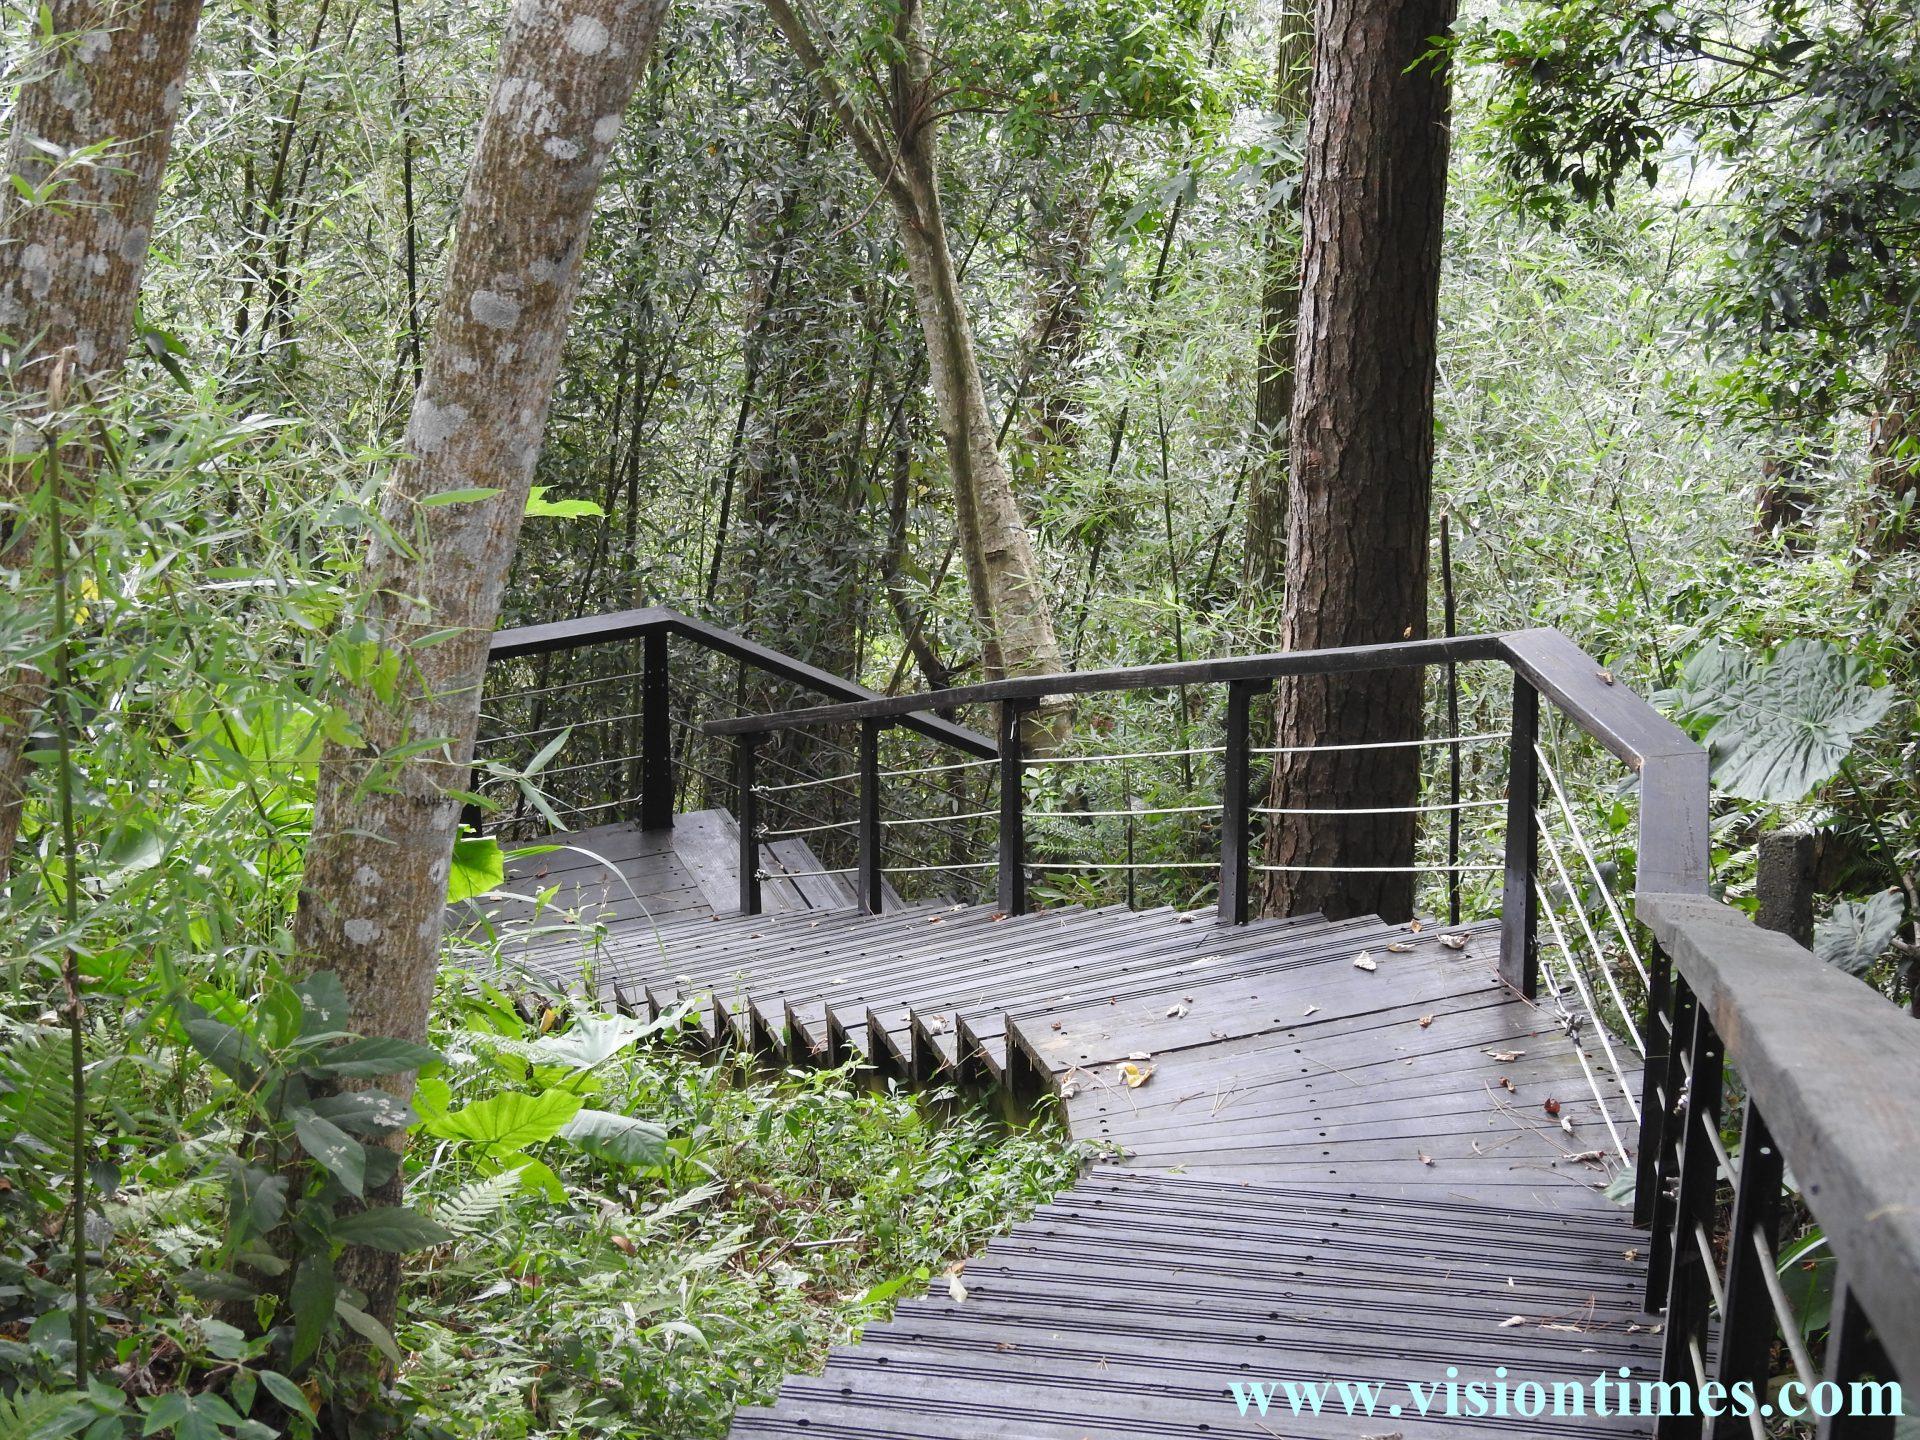 A 165-meter wood path was originally designed as an emergency evacuation trail for Chiang Kai-shek. (Image: Julia Fu / Vision Times)